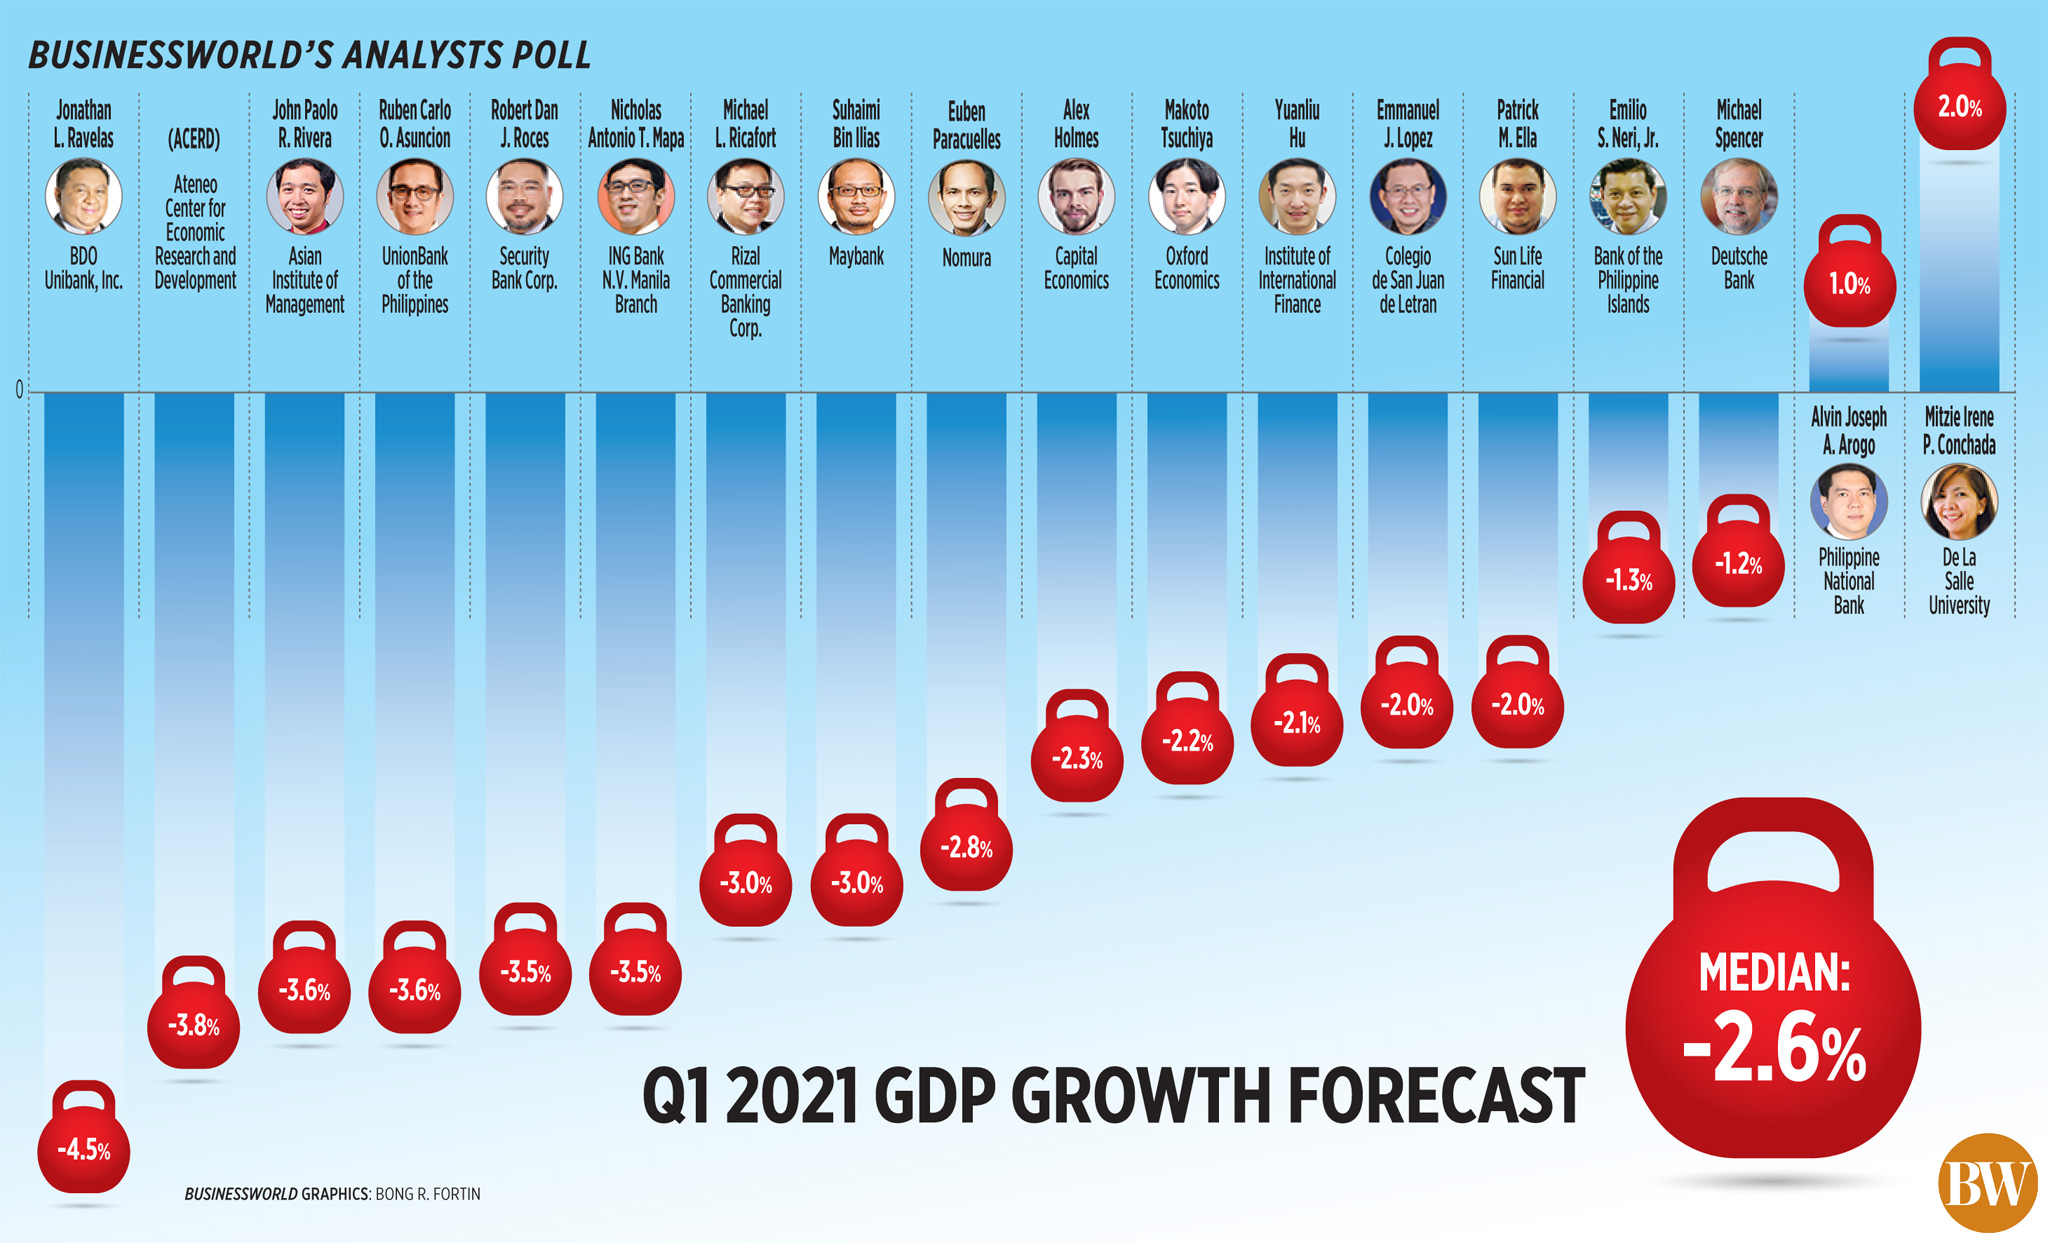 Q1 2021 GDP Growth Forecast